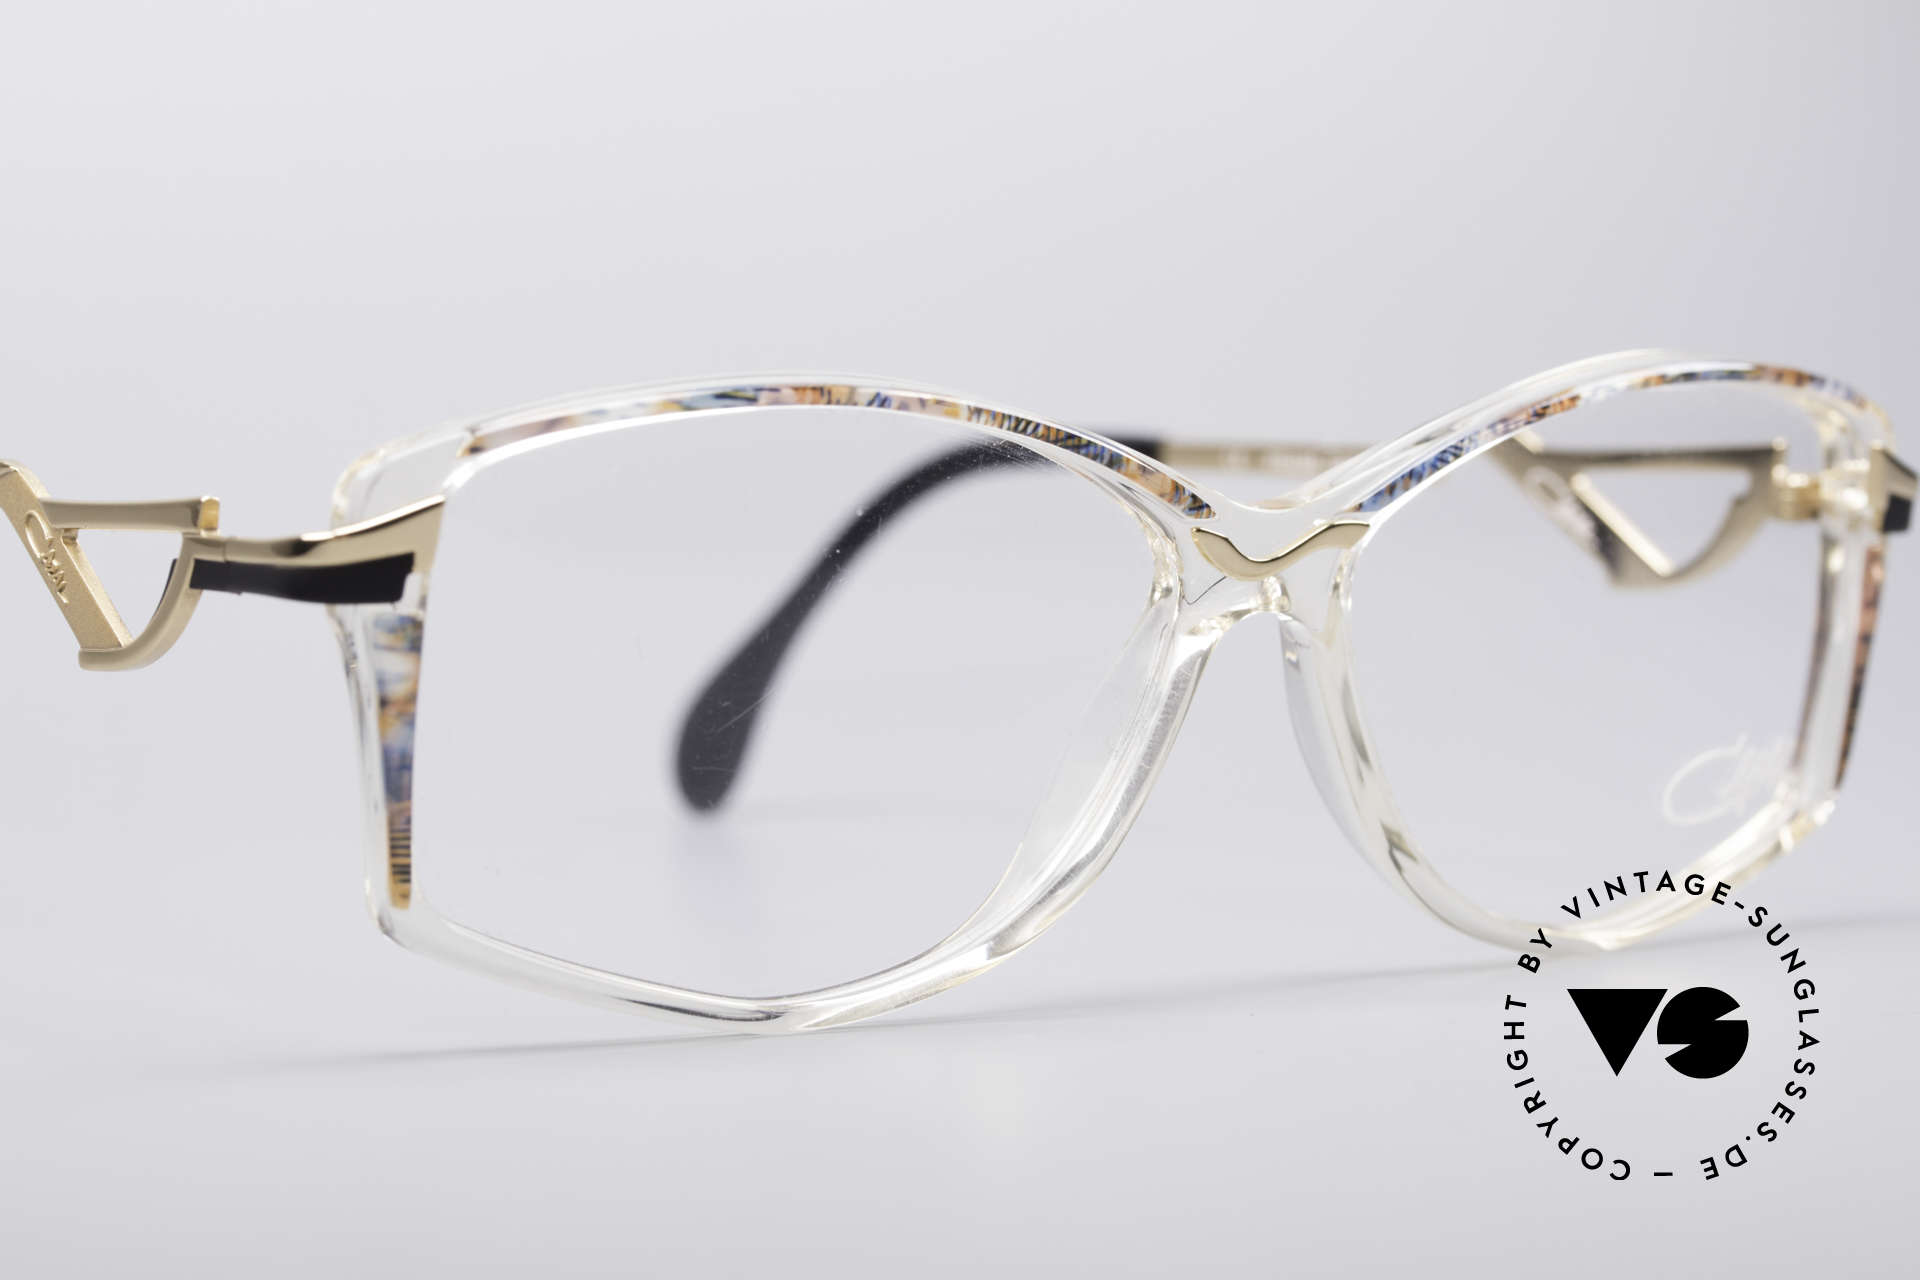 Cazal 369 90's Ladies Designer Glasses, NO RETRO GLASSES, but a fancy old 1990's ORIGINAL!, Made for Women